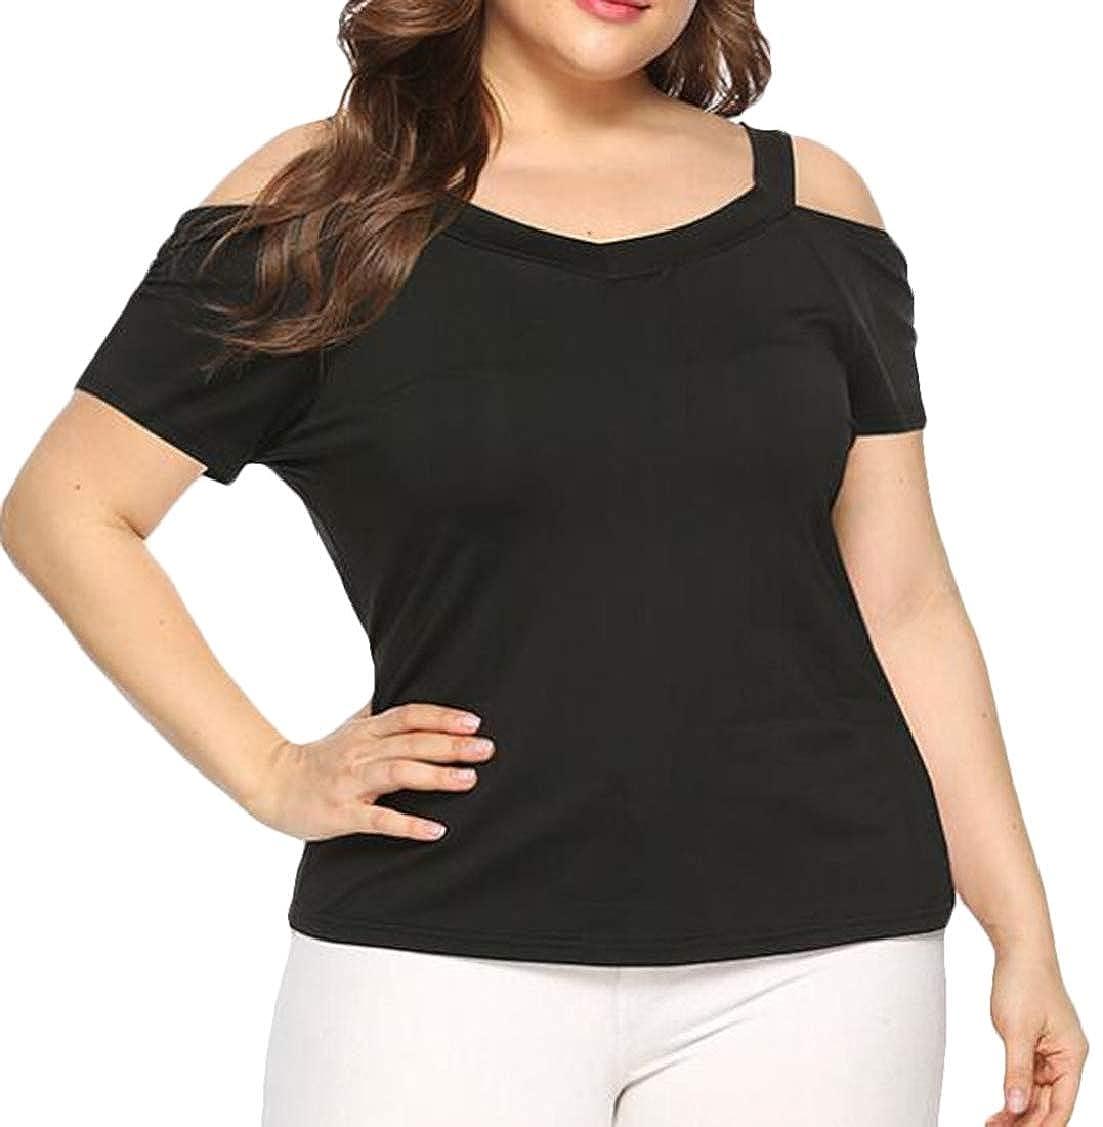 Rrive Womens Short Sleeve Plus Size V Neck Cold Shoulder Pure Color T-Shirt Tee Top